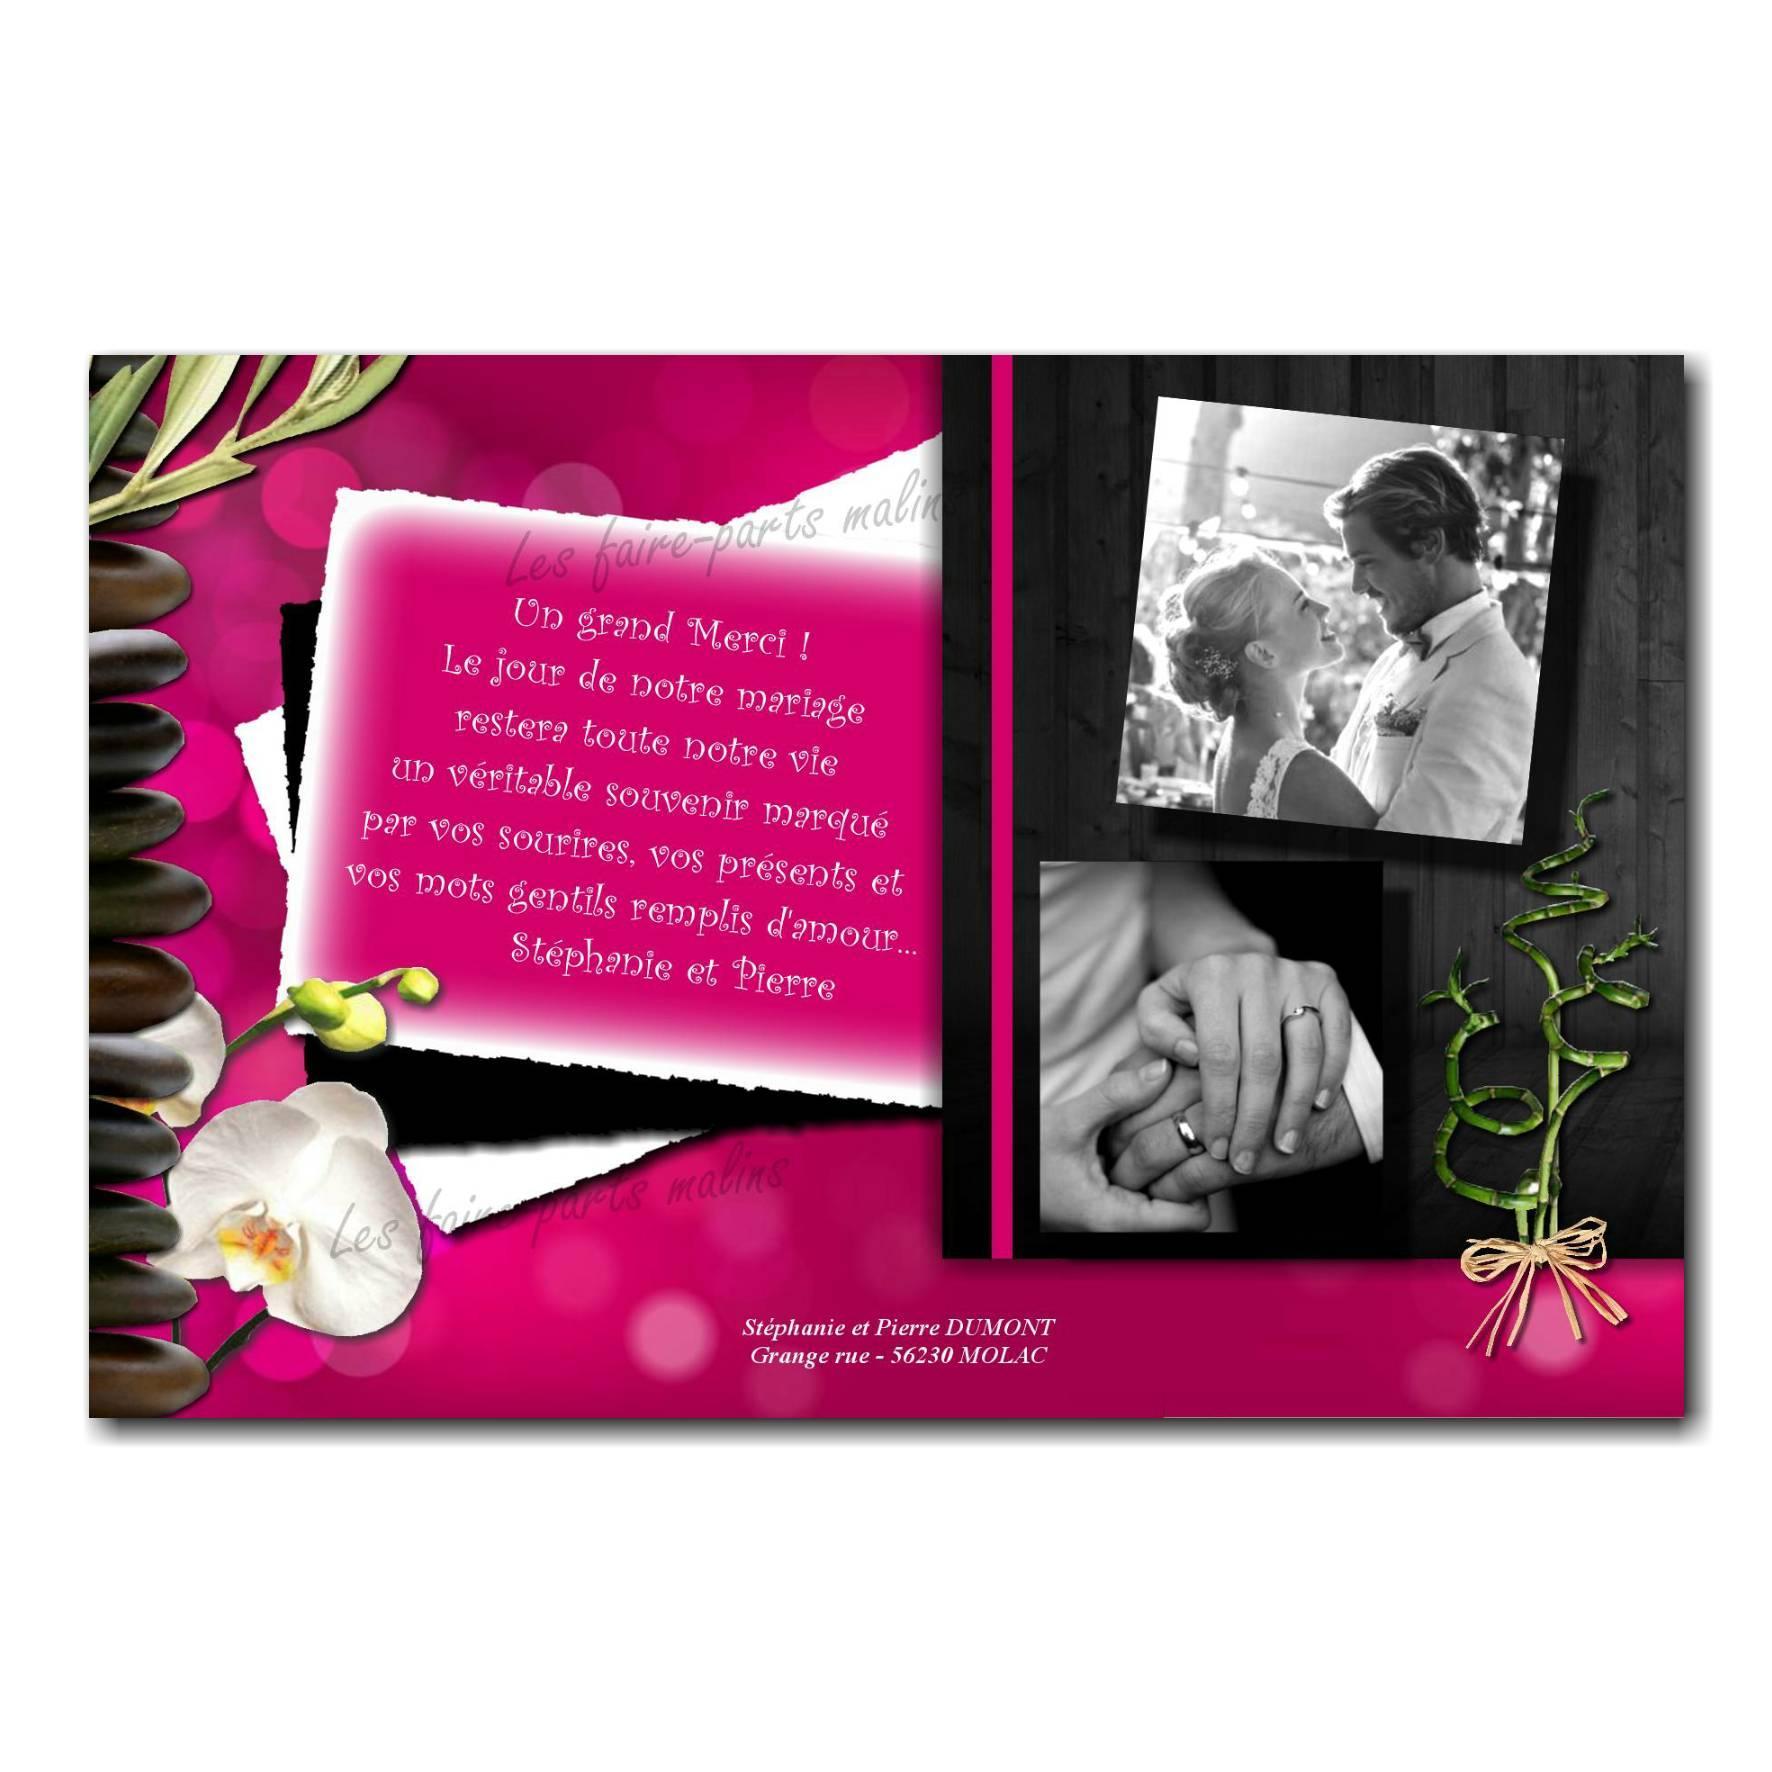 159 mariage remerciements 2 photos